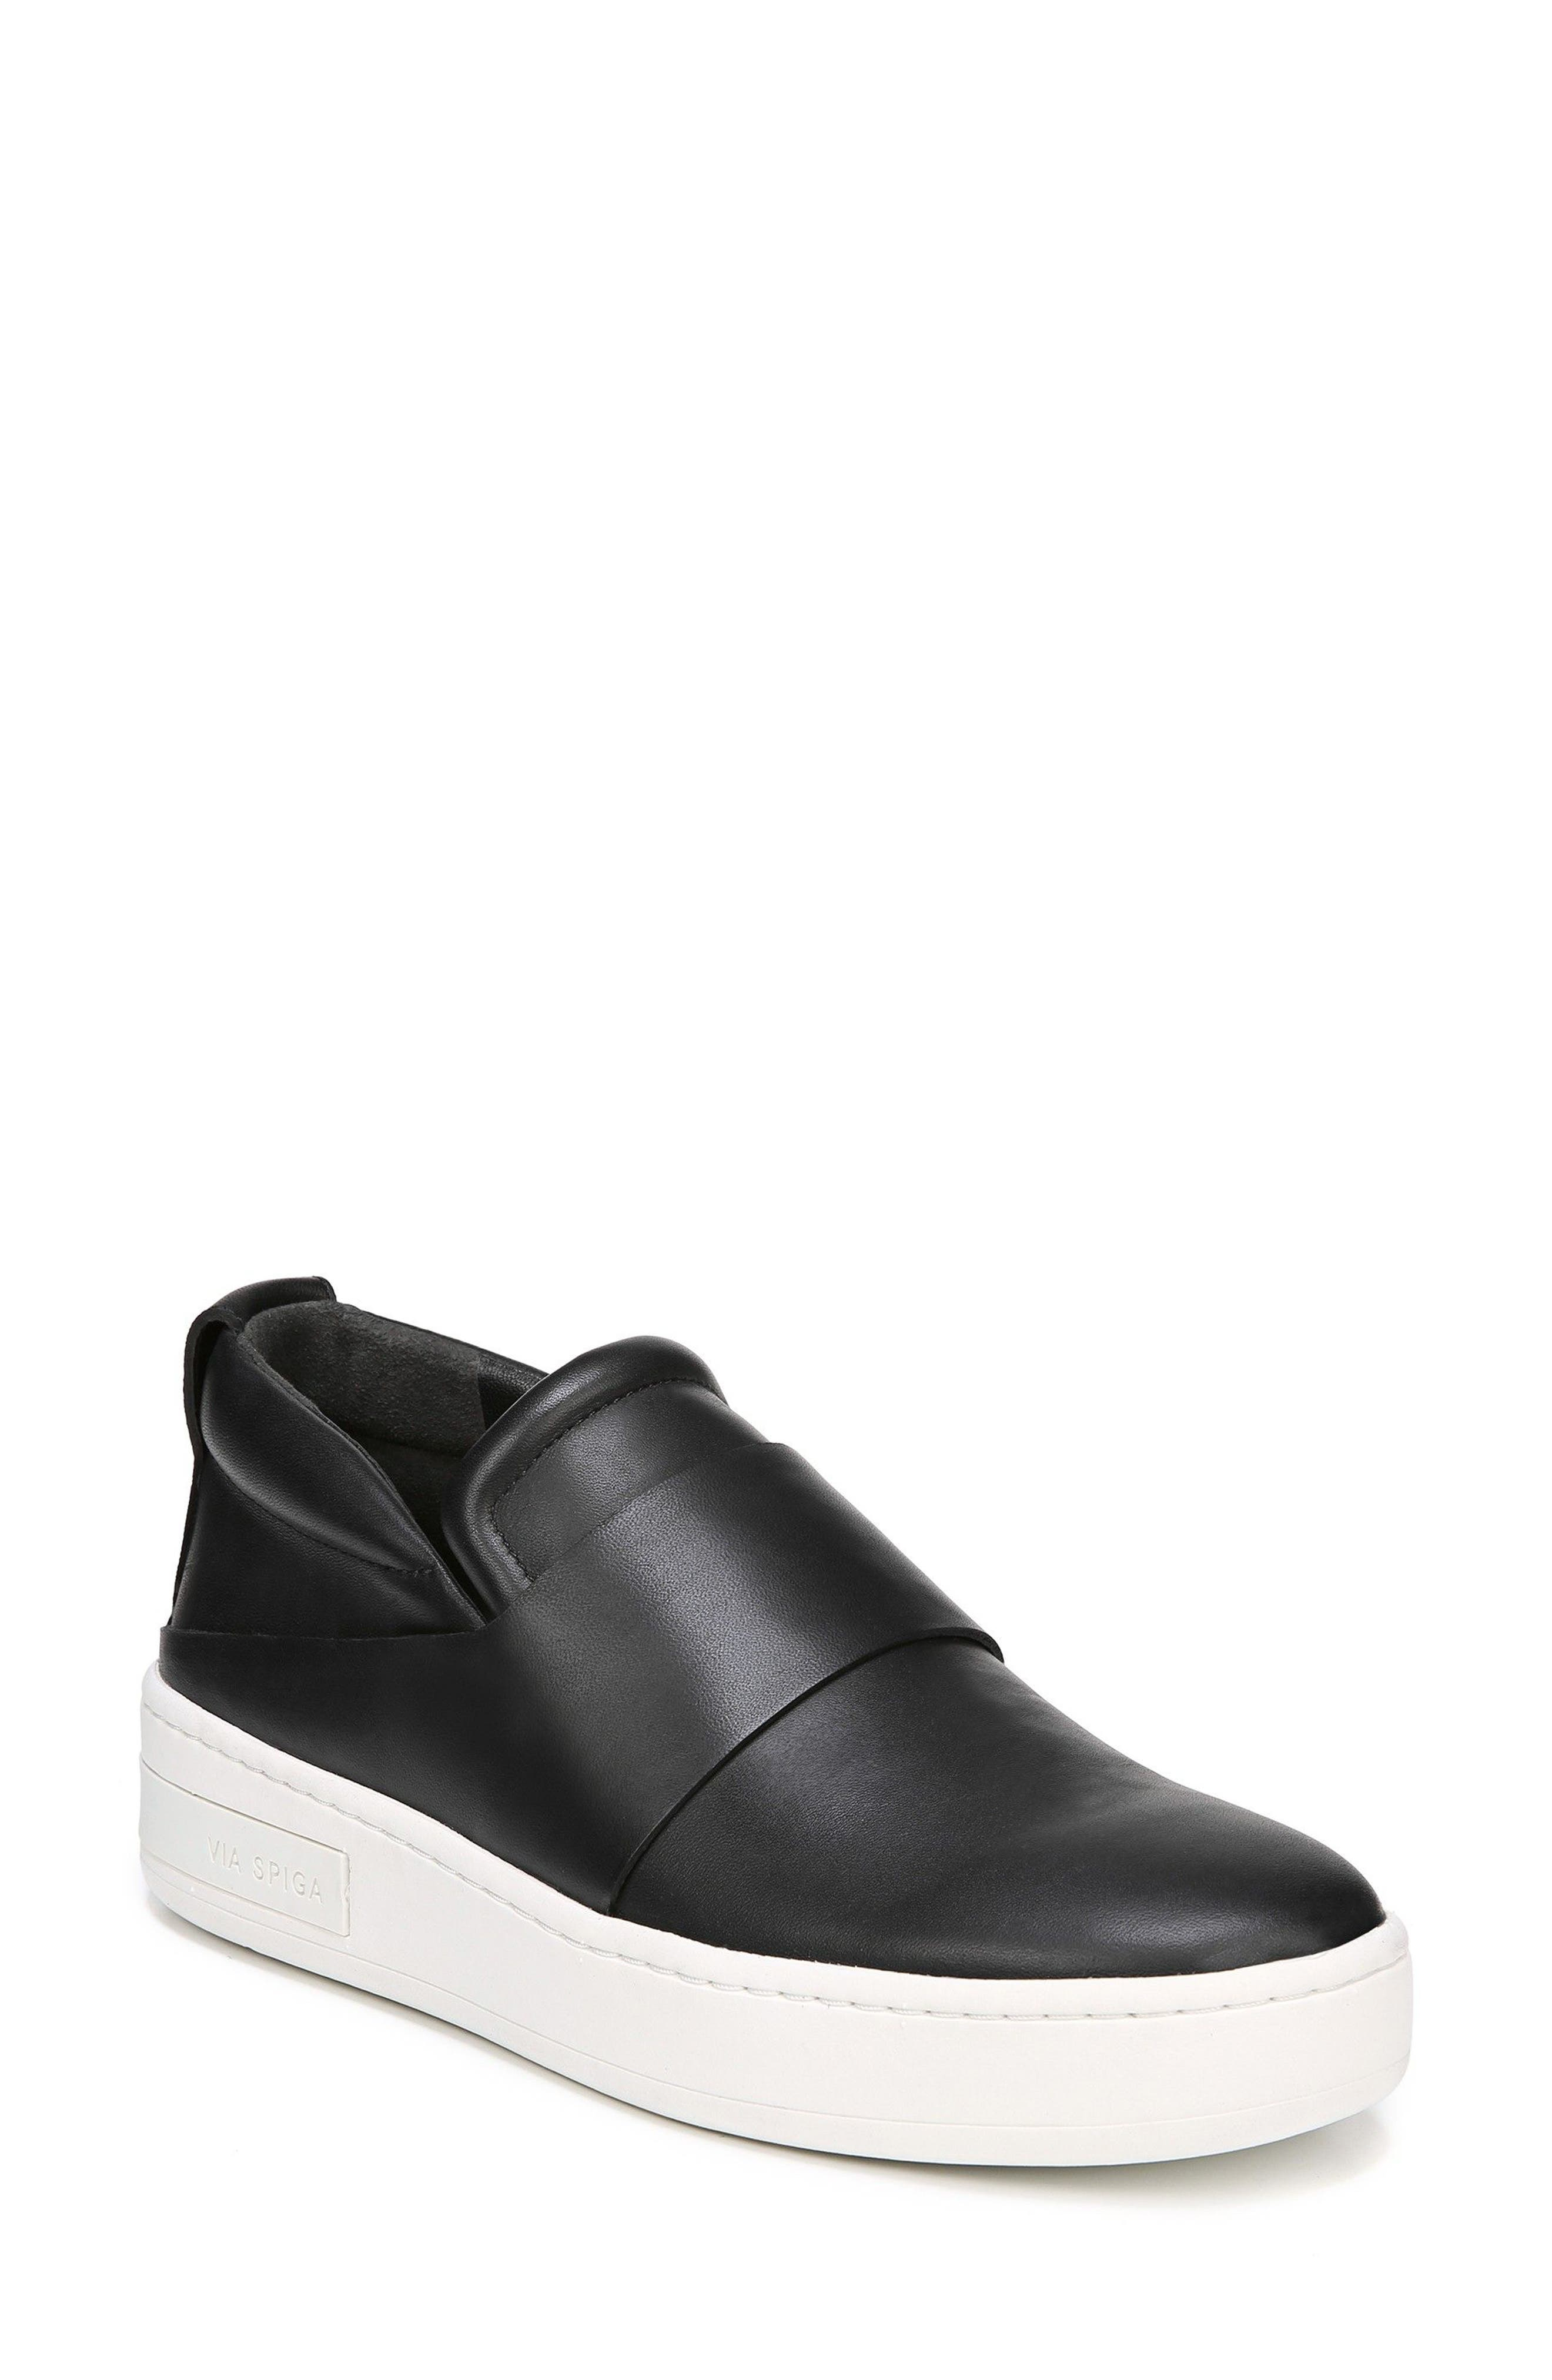 Ryder Slip-On Sneaker,                             Main thumbnail 1, color,                             Black Leather